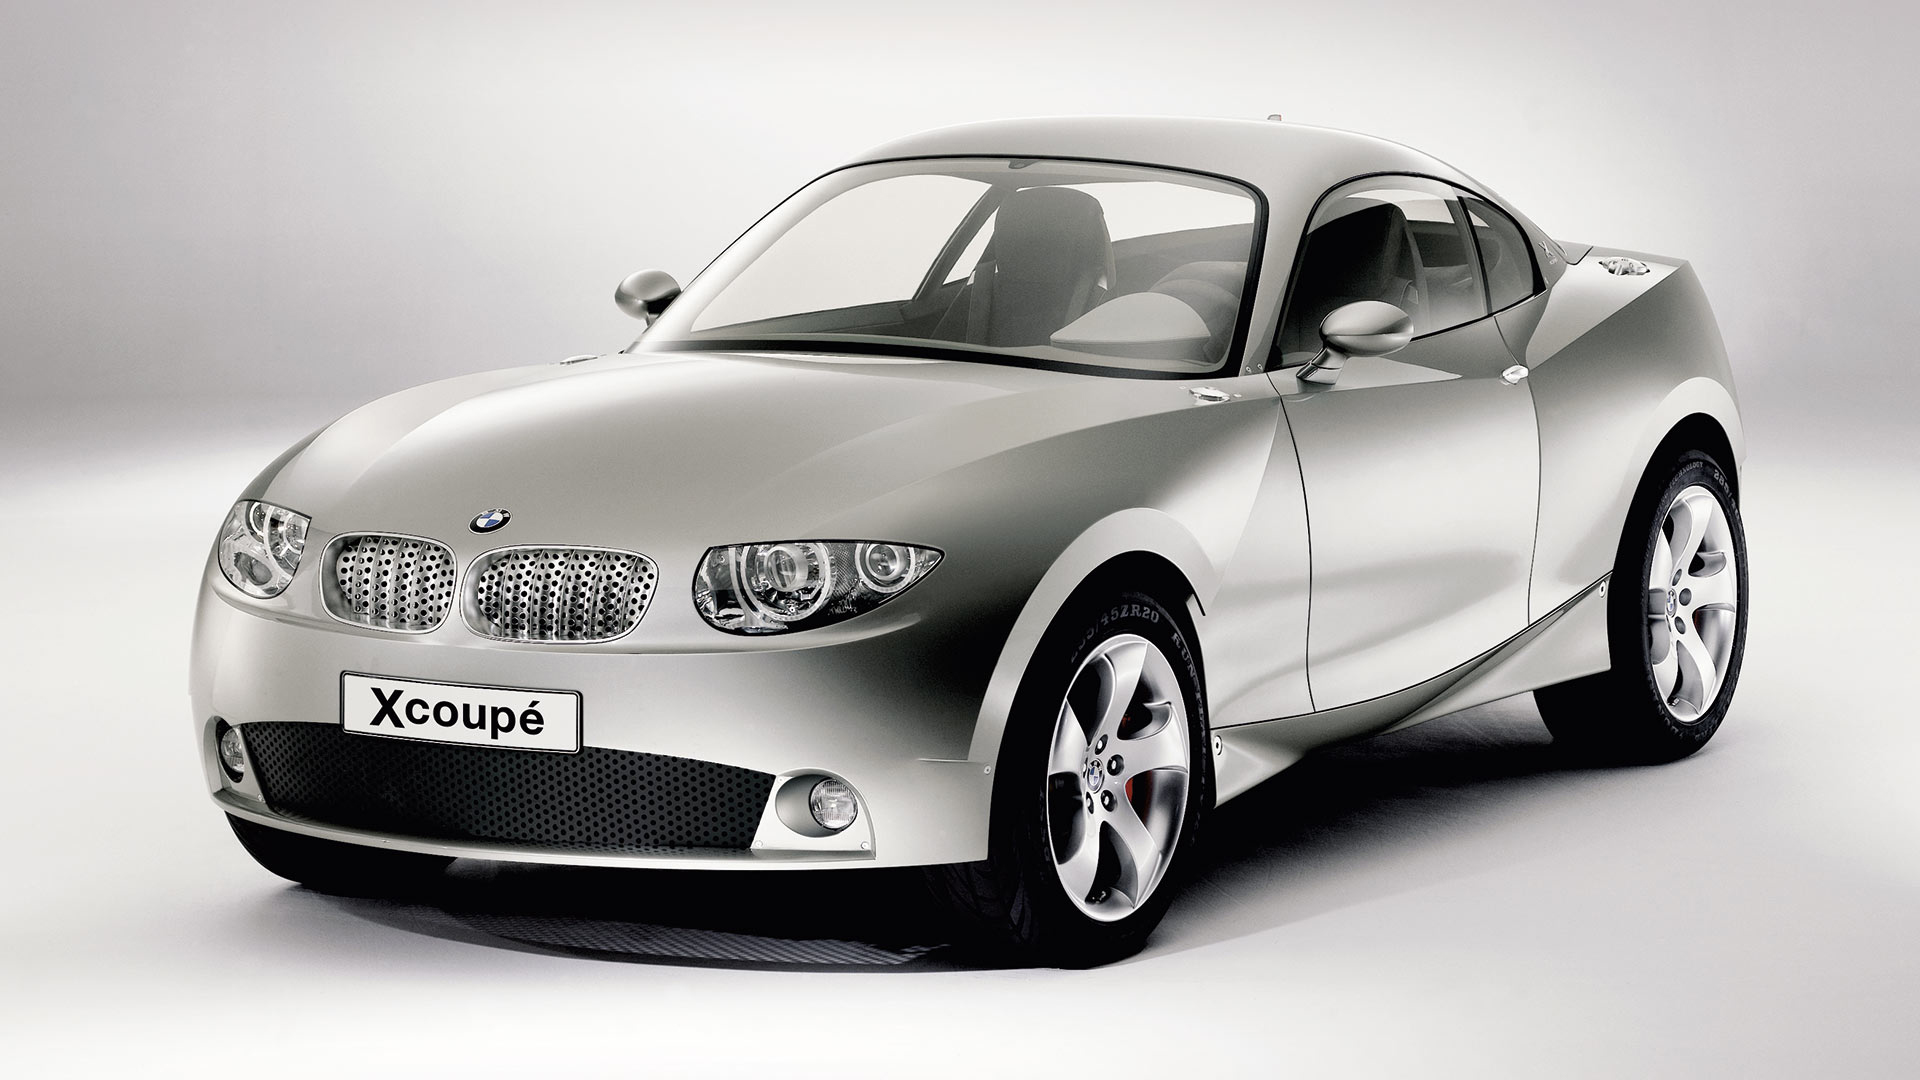 2001 BMW X-Coupe Concept